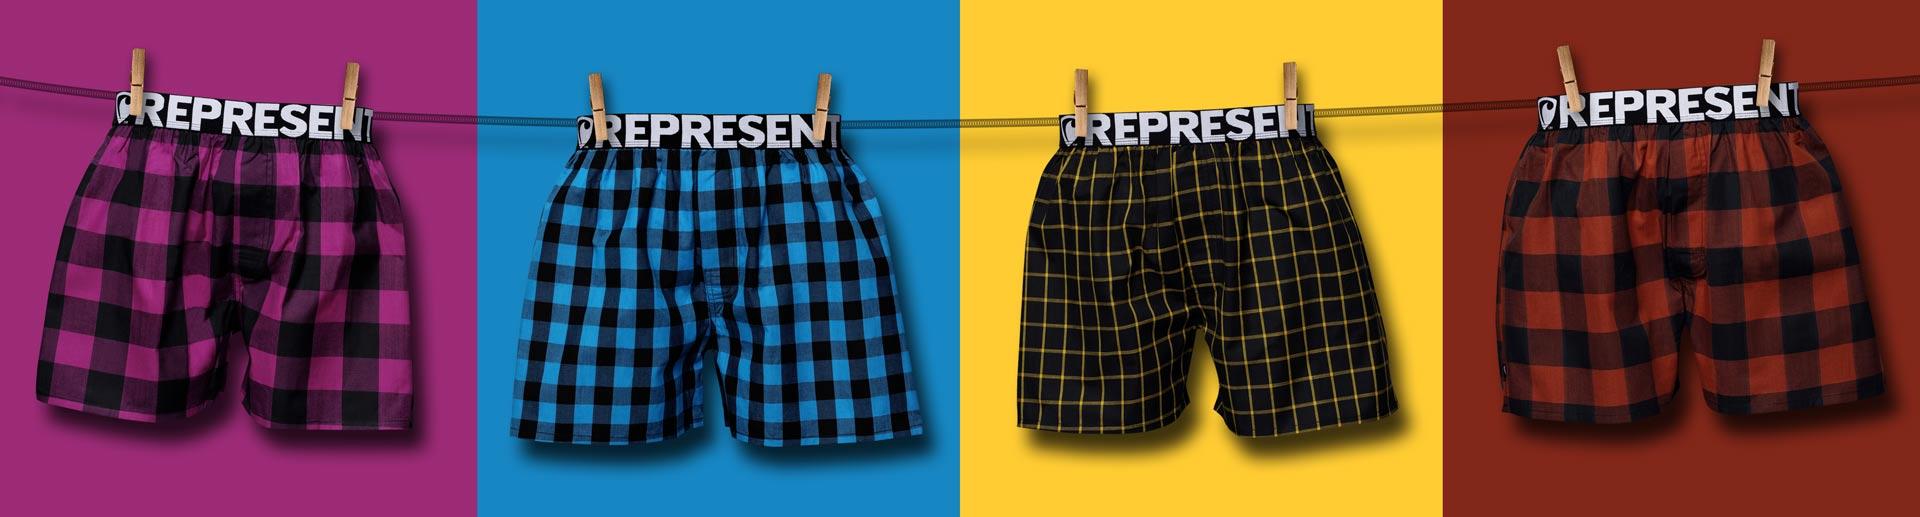 Nové pánské boxerky Represent Classic